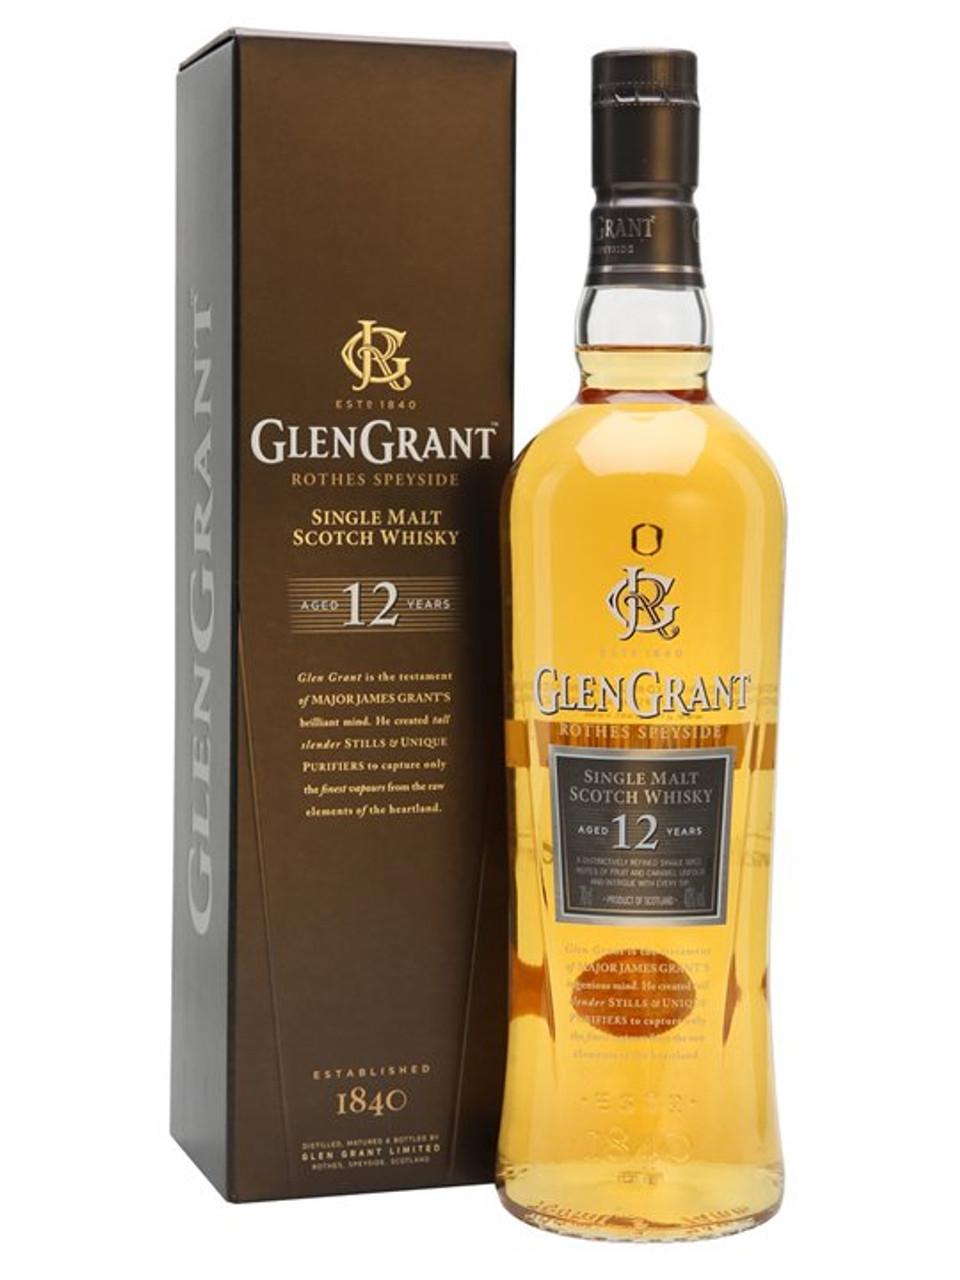 Glengrant 12 Year Single Malt Scotch Whisky 750ml